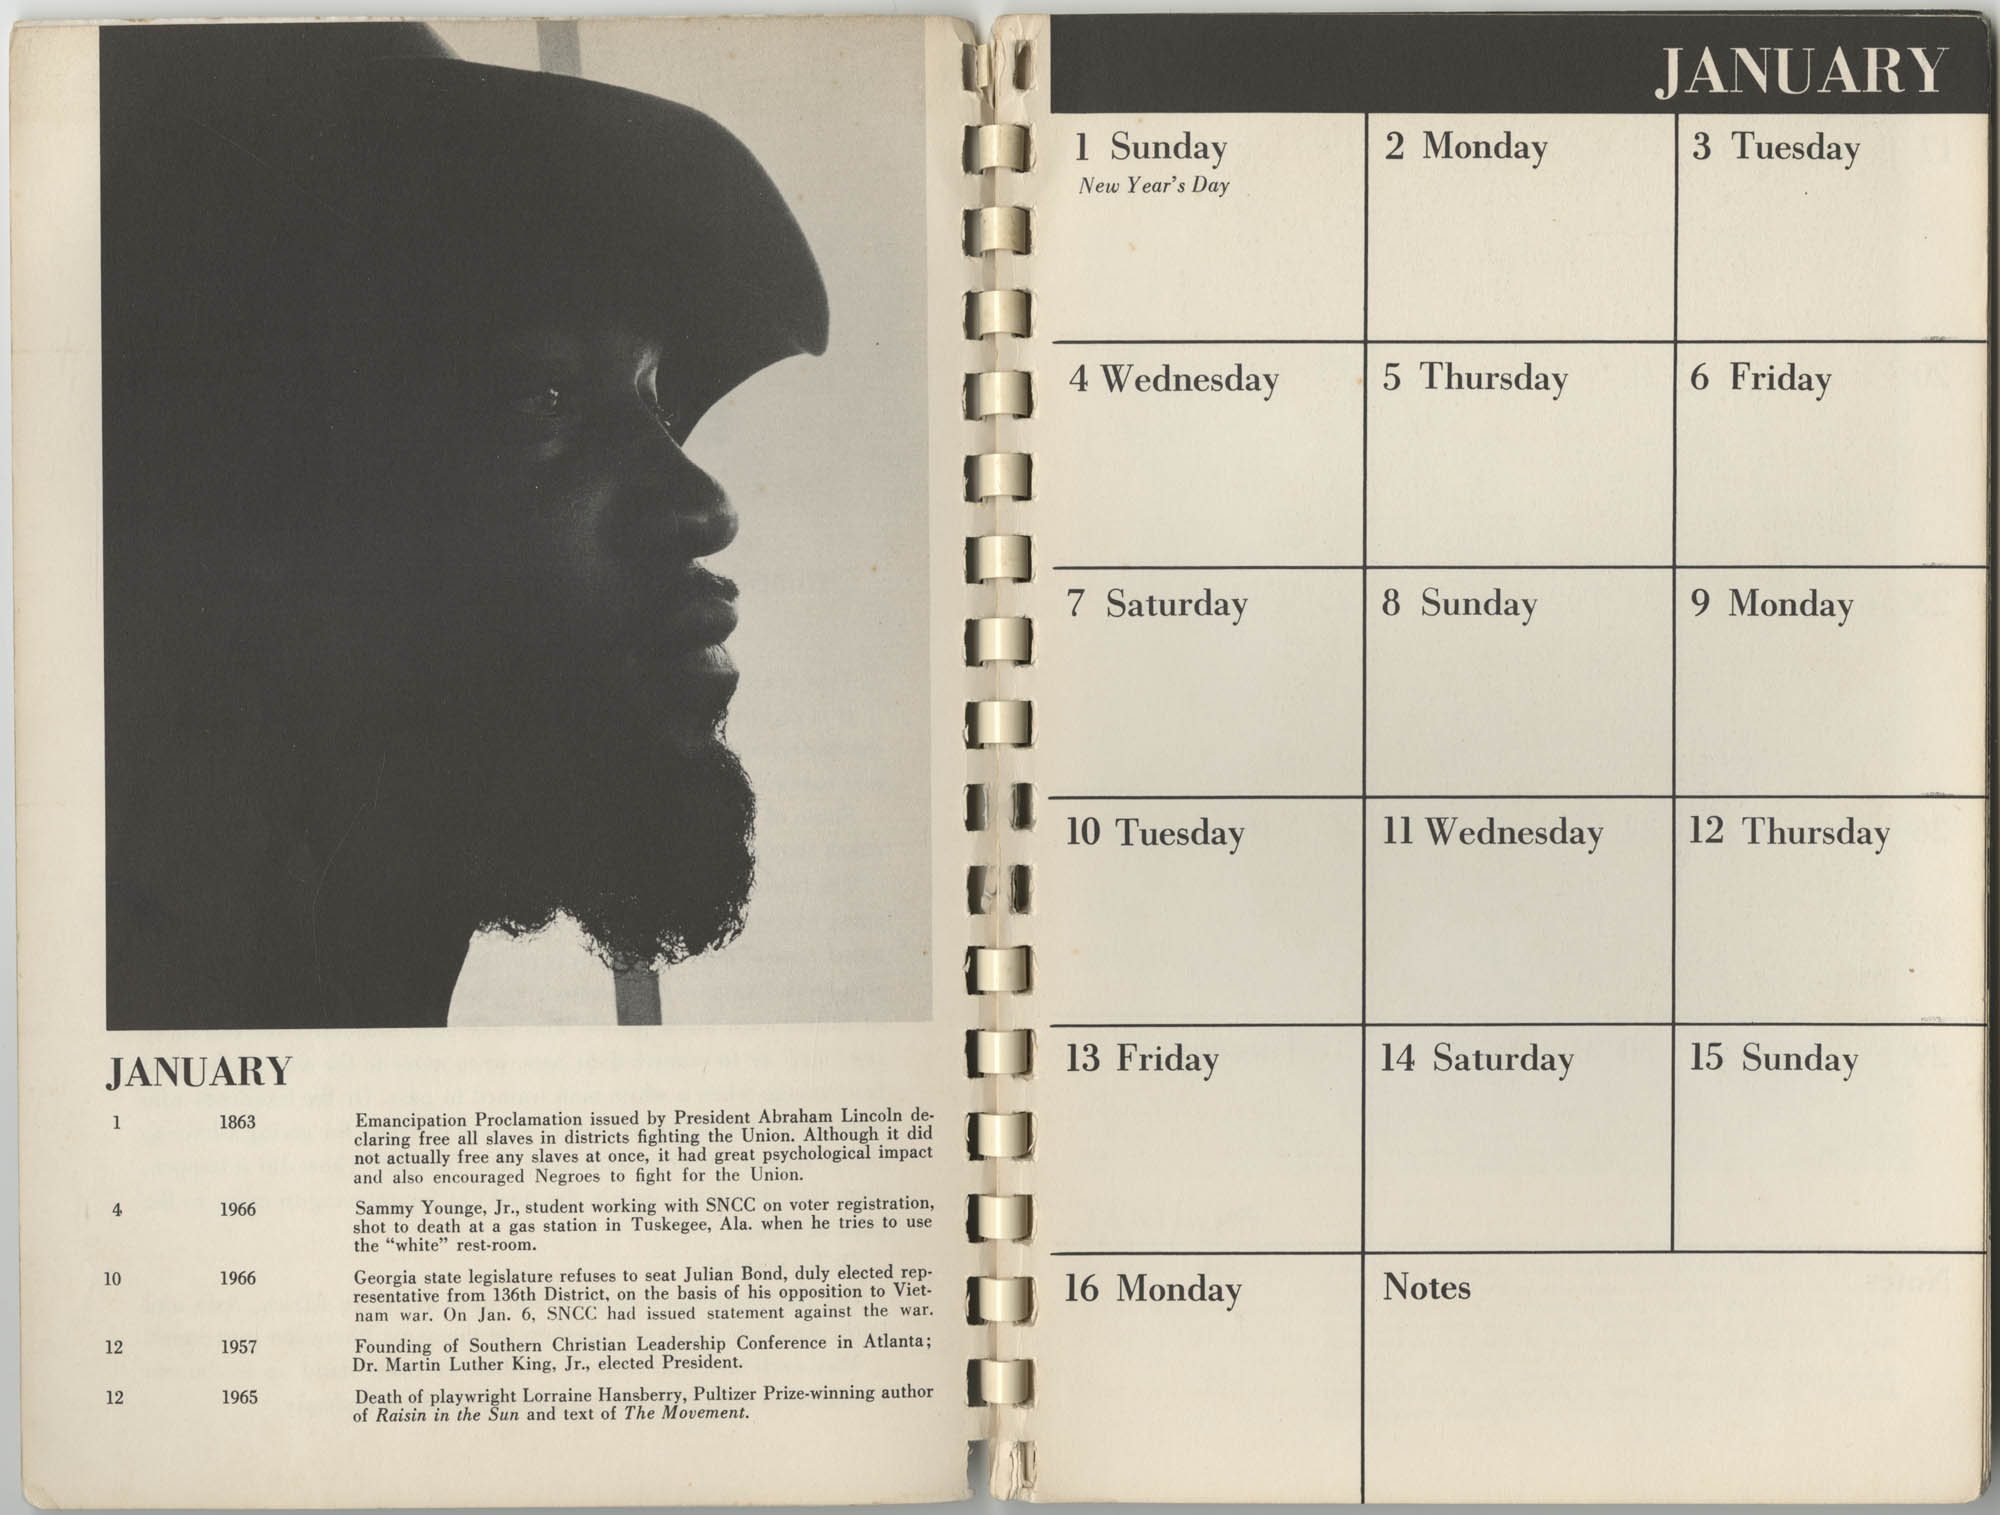 1967 SNCC Calendar, January 1-16